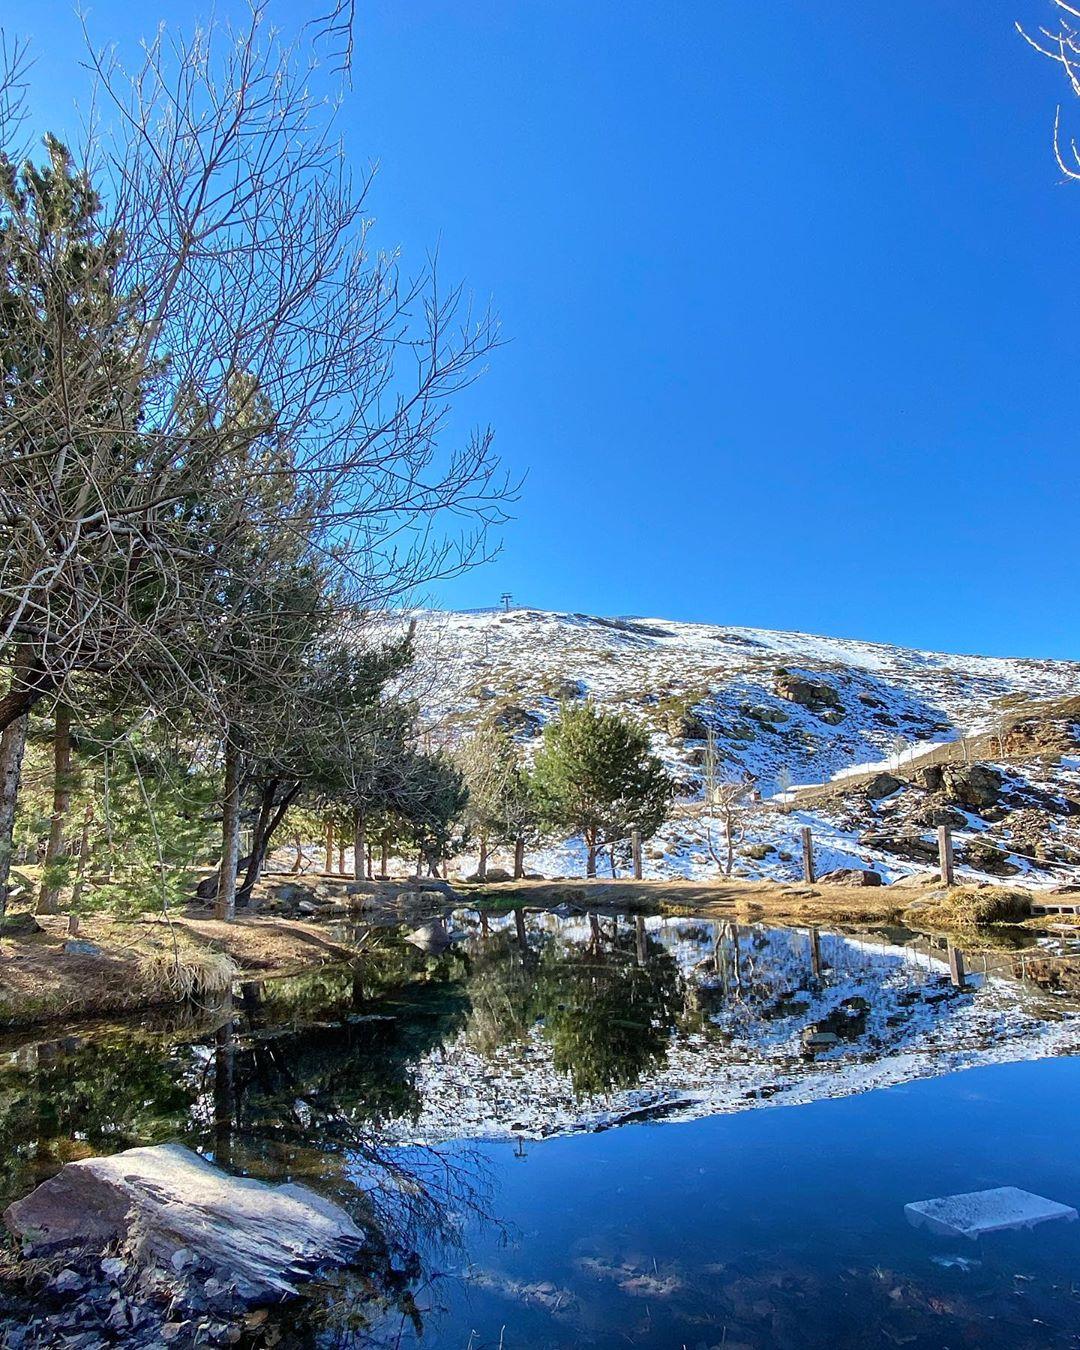 Gunung sierra nevada